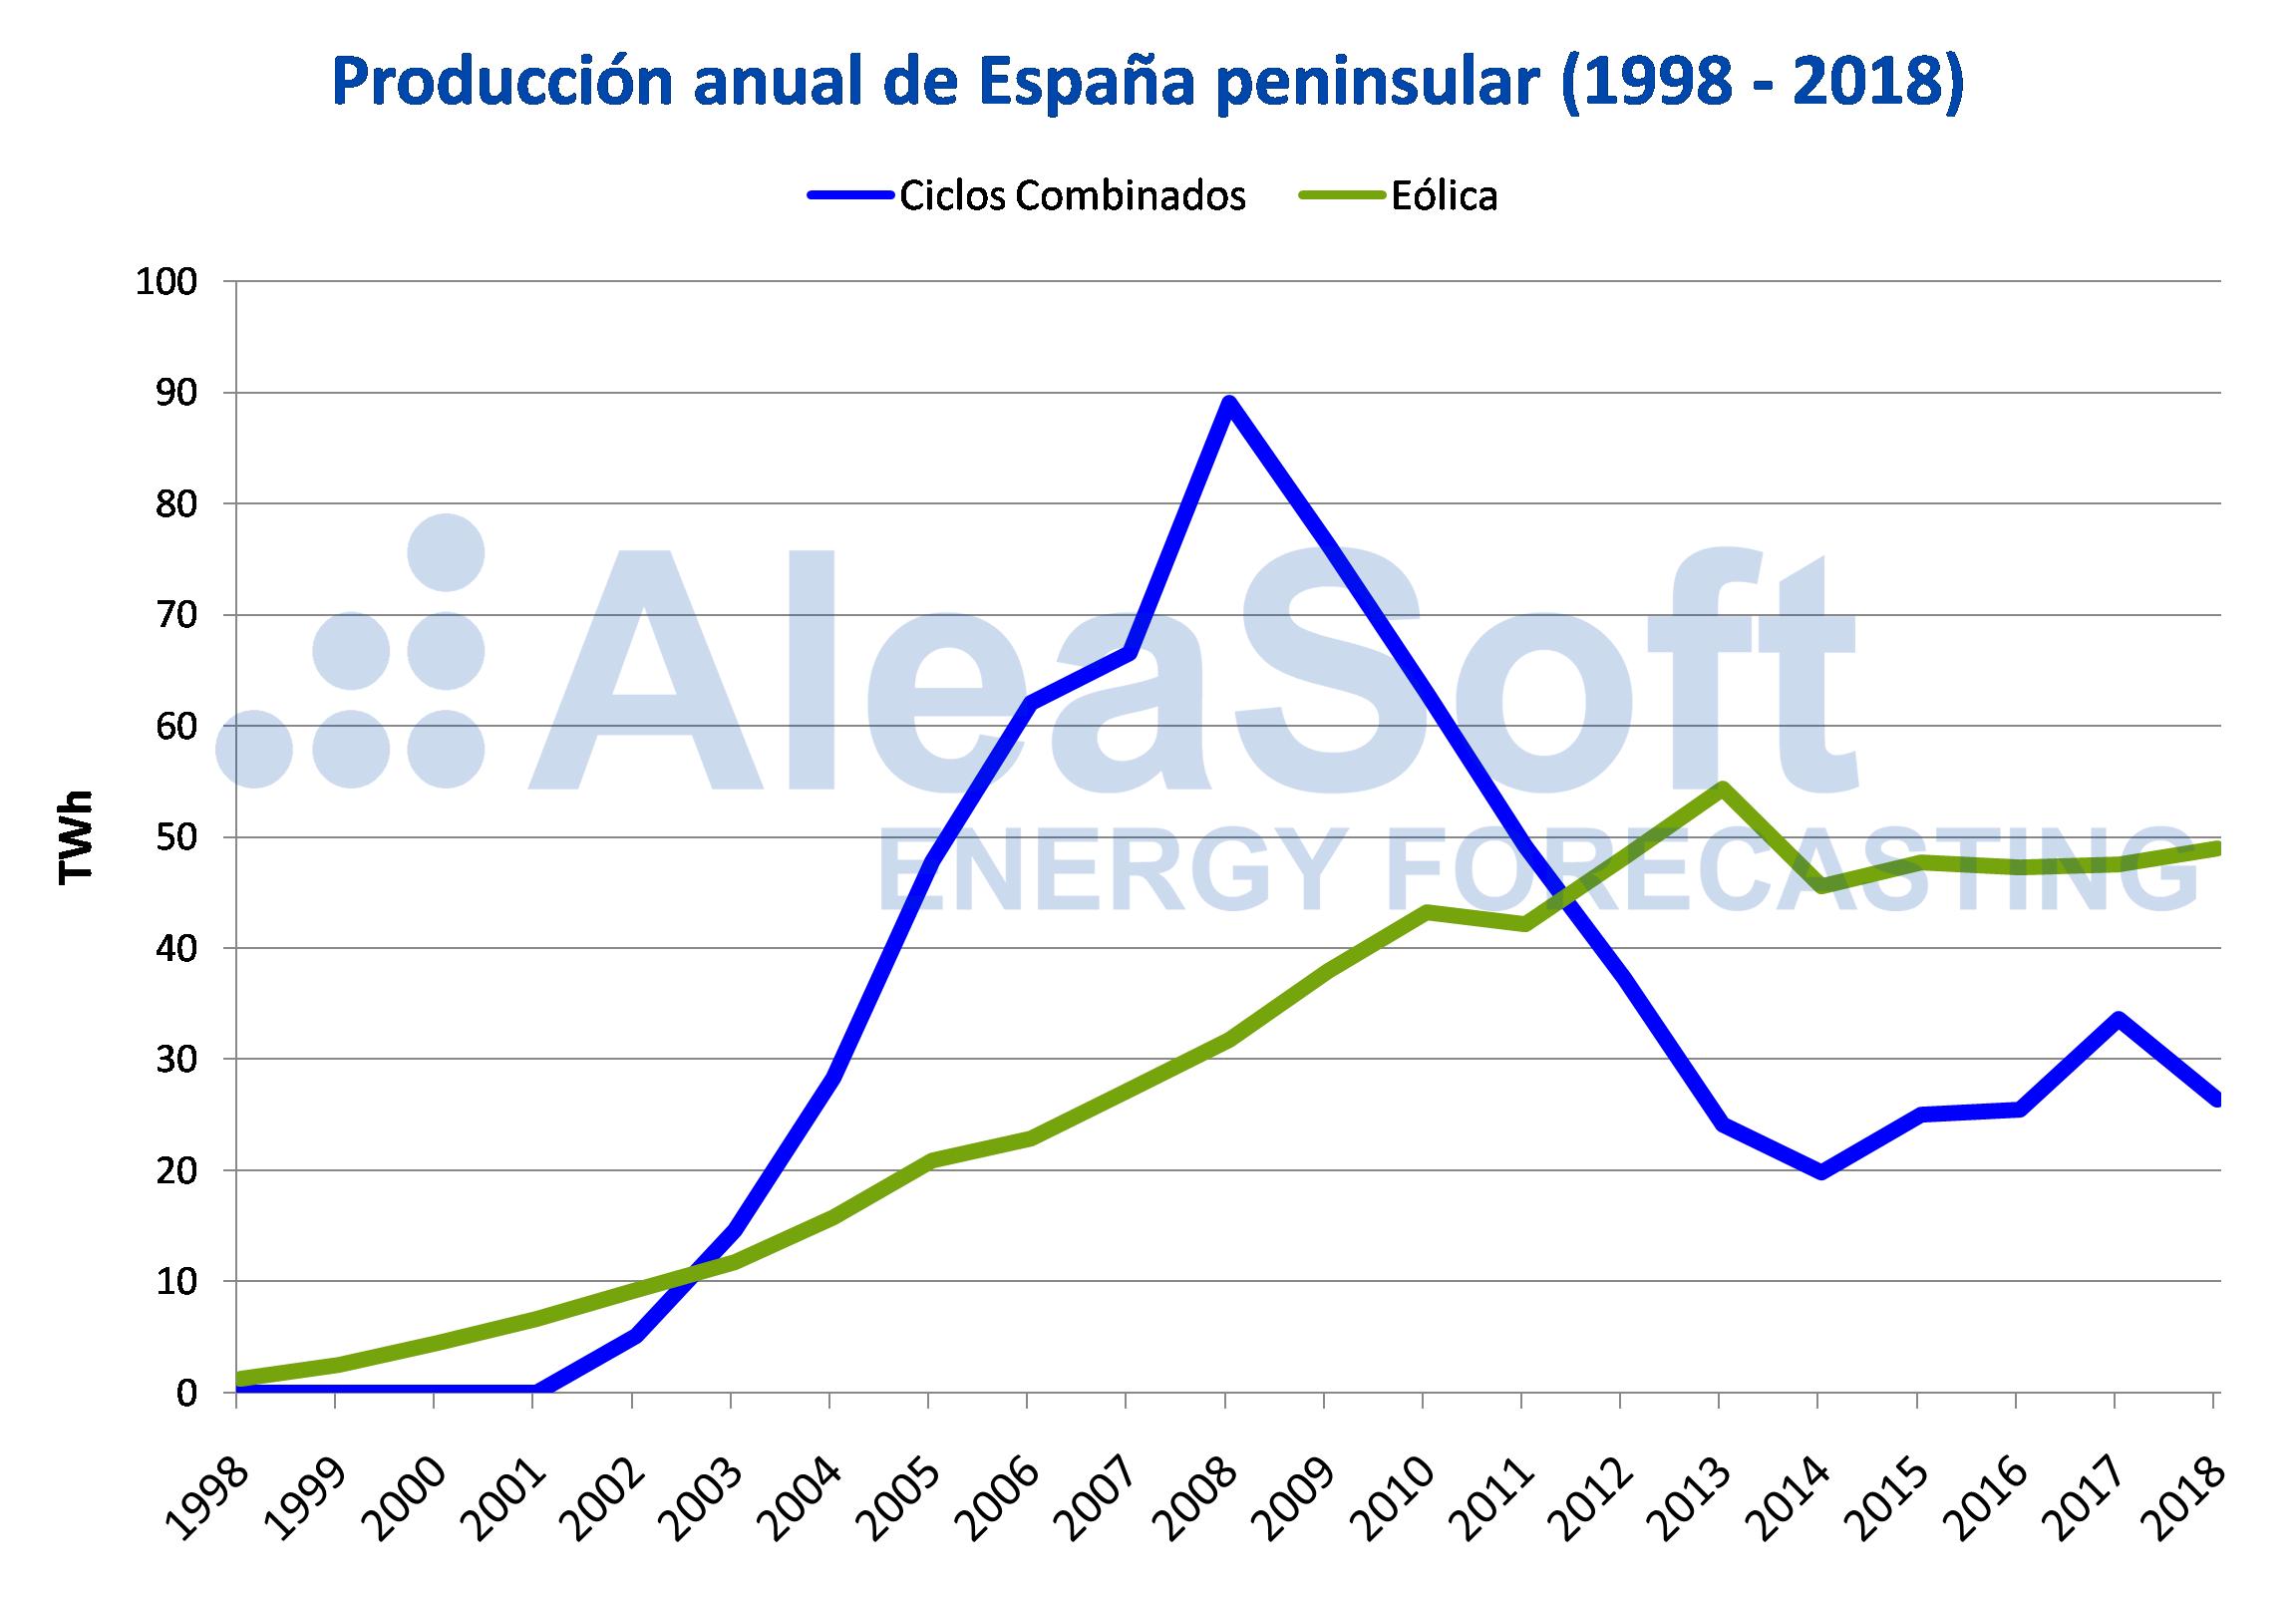 AleaSoft - Producción ciclos combinados eólica anual España peninsular